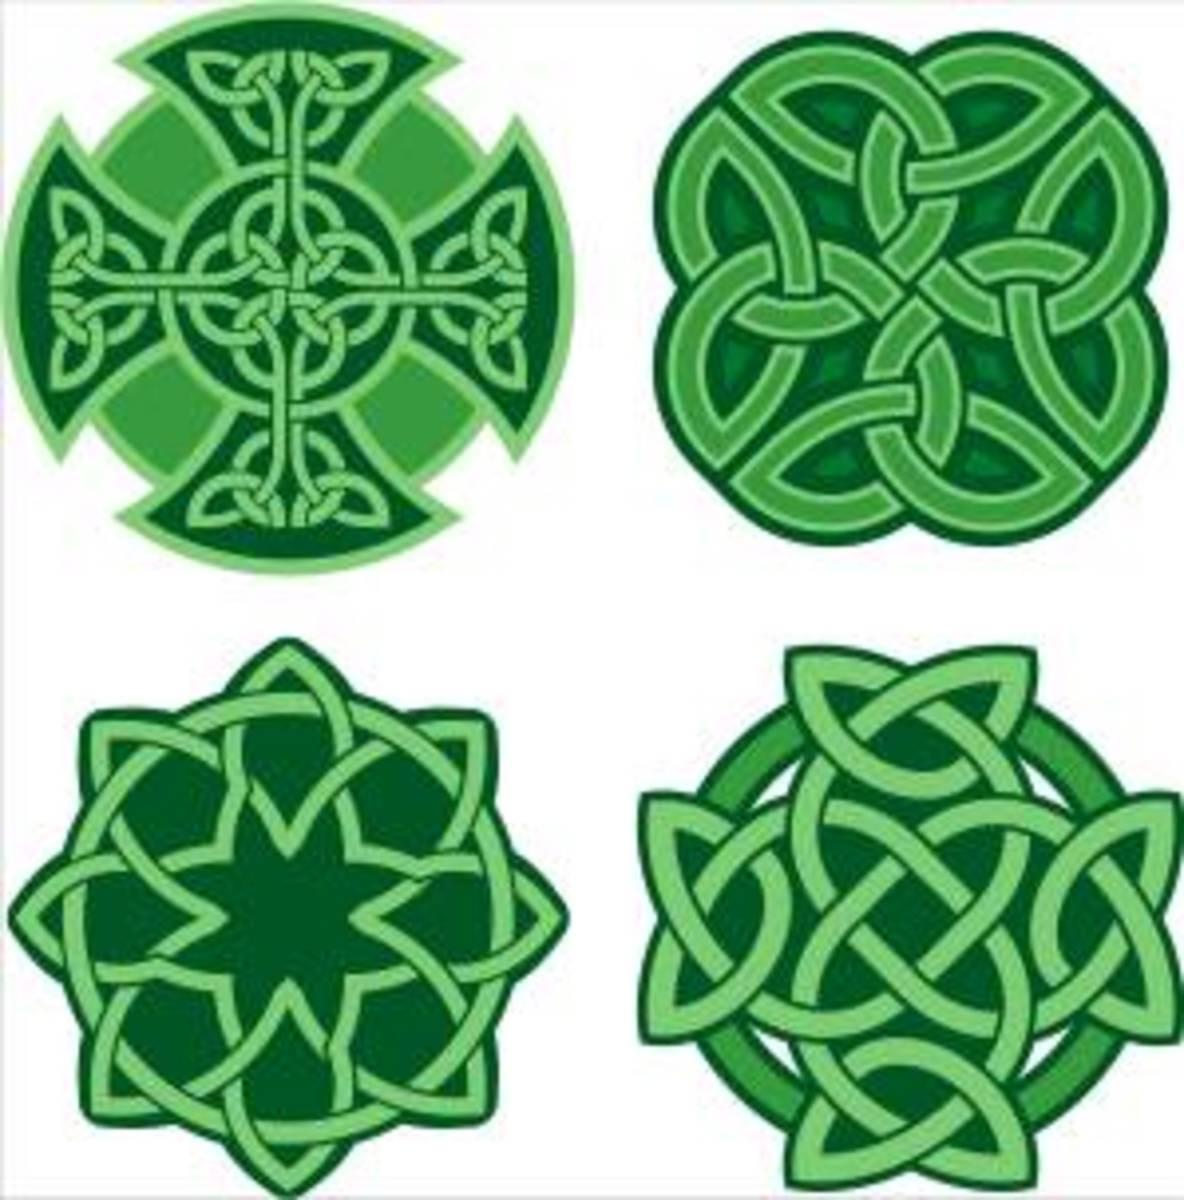 Celtic Gaelic knots - symbols of the Gaelic culture in Ireland.